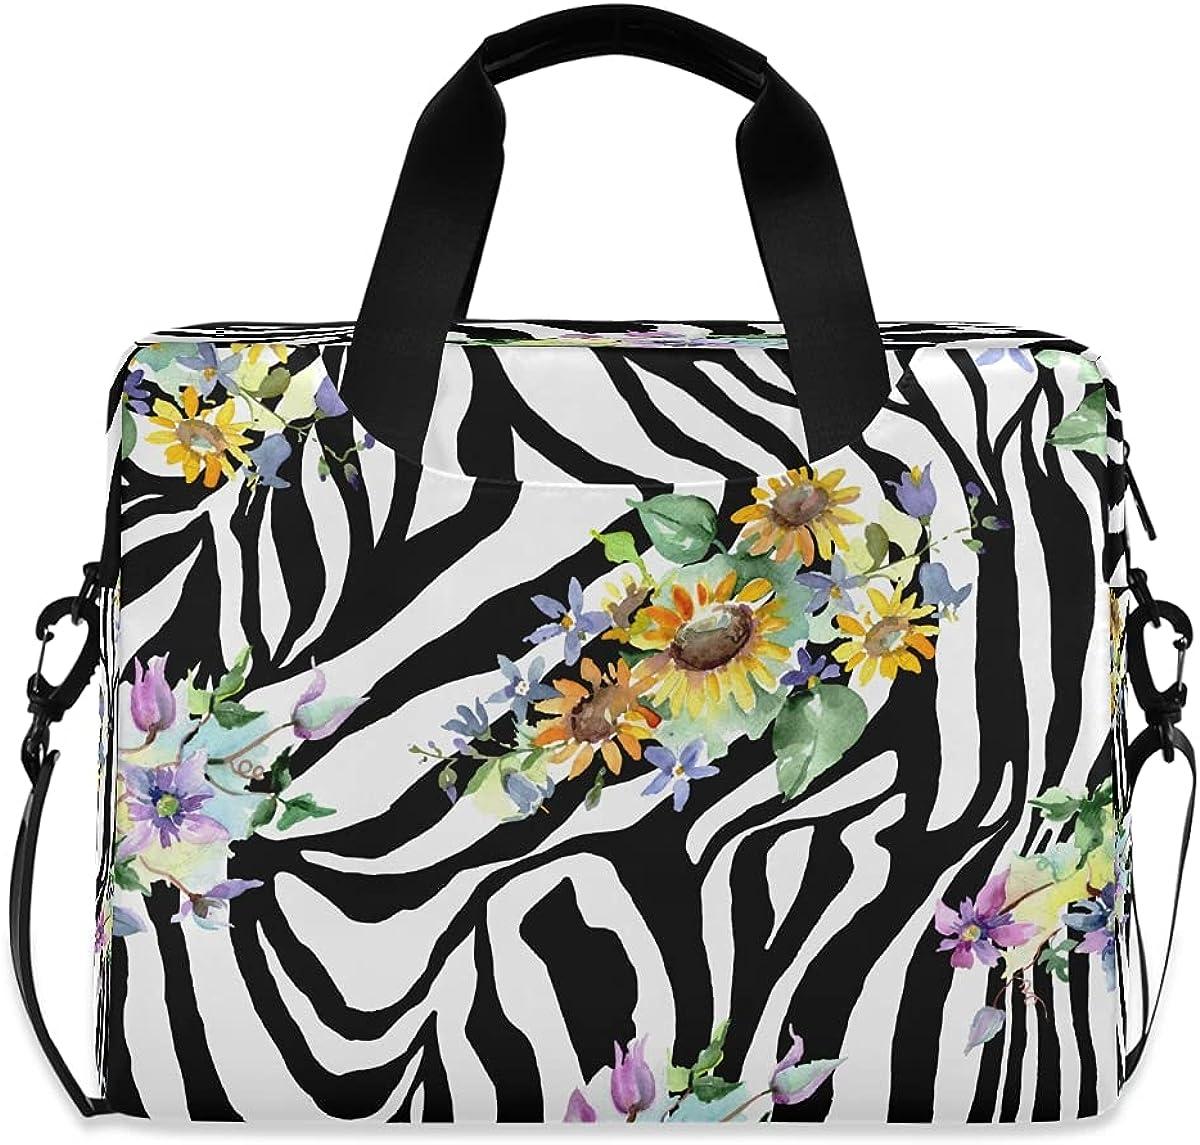 JMbuild Laptop Case 15.6 inch Zebra Skin Animal Com Flower Print Large special price !! Max 58% OFF